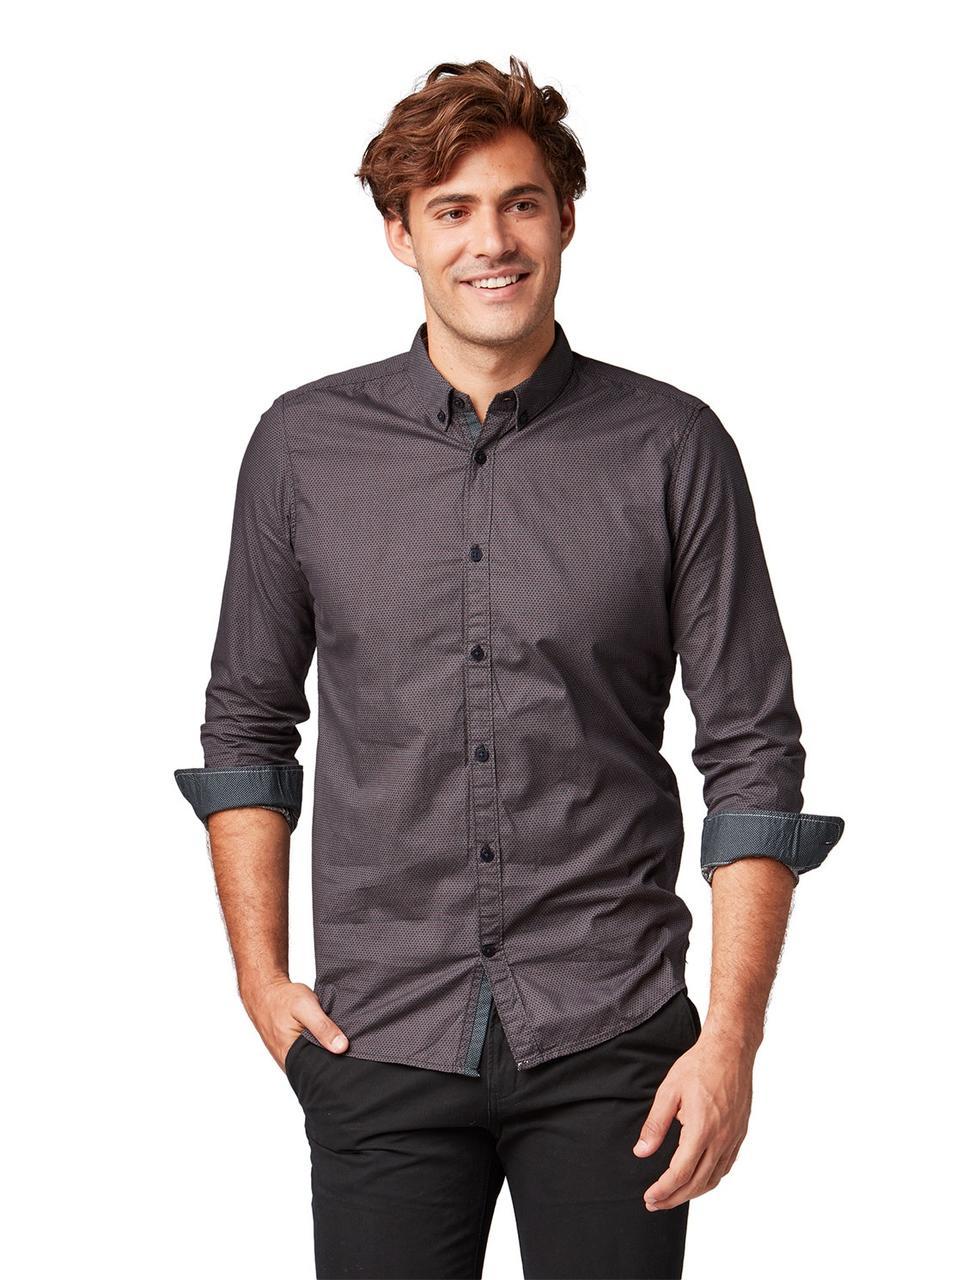 Рубашка Tom Tailor 20557050910 XL Тёмно-серый